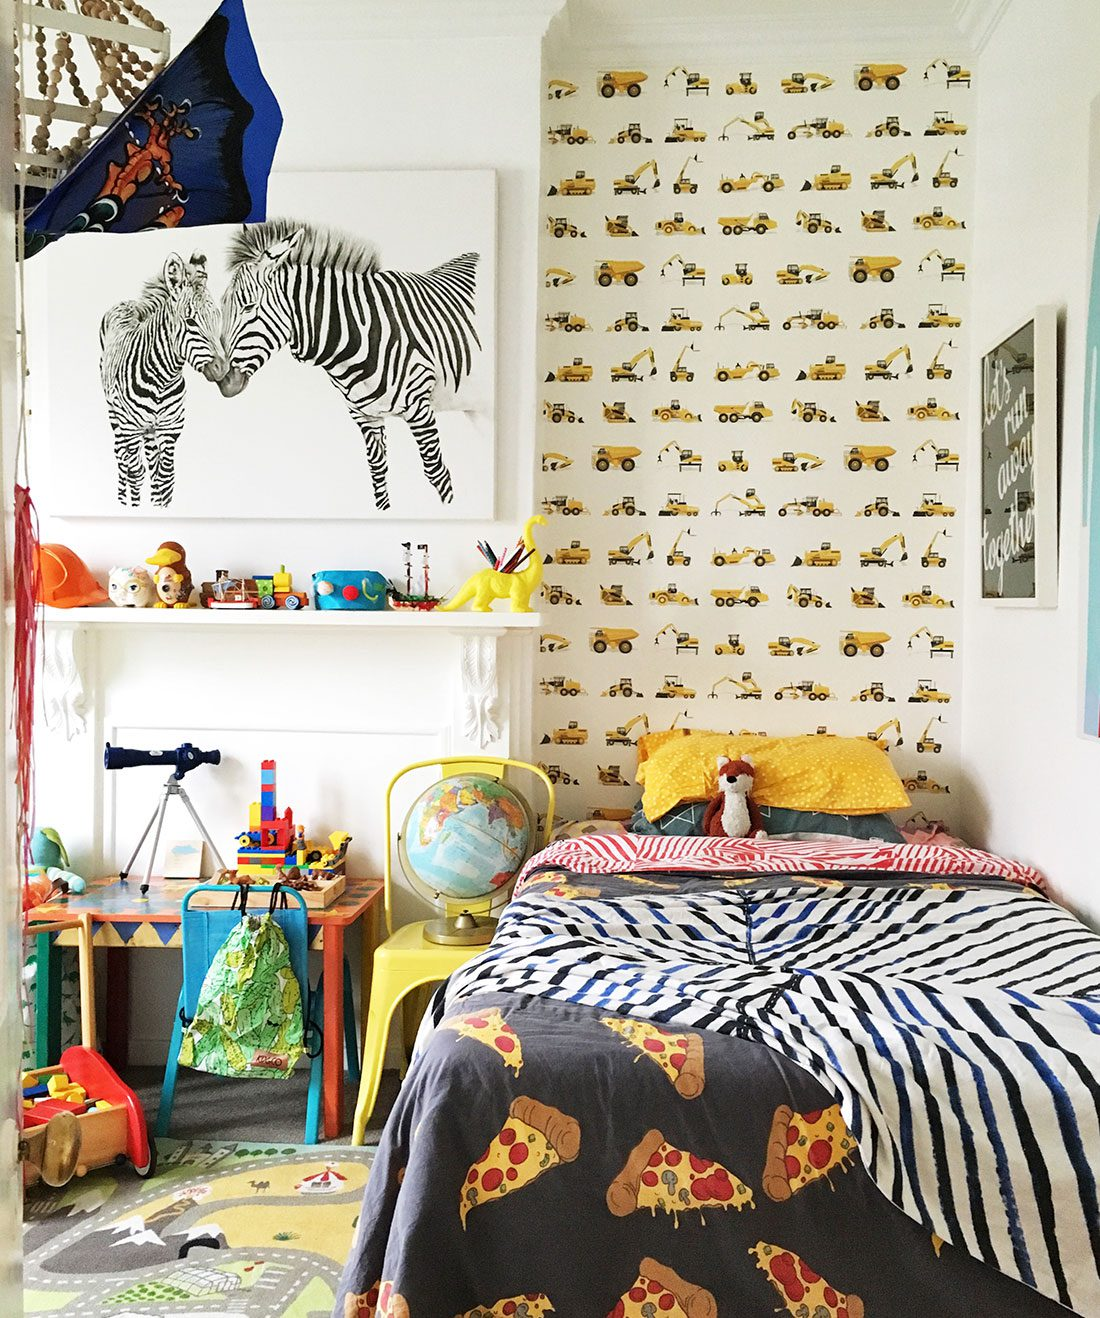 Tonka Tough • Tonka Wallpaper • Yellow Trucks • Construction Wallpaper • Milton & King USA